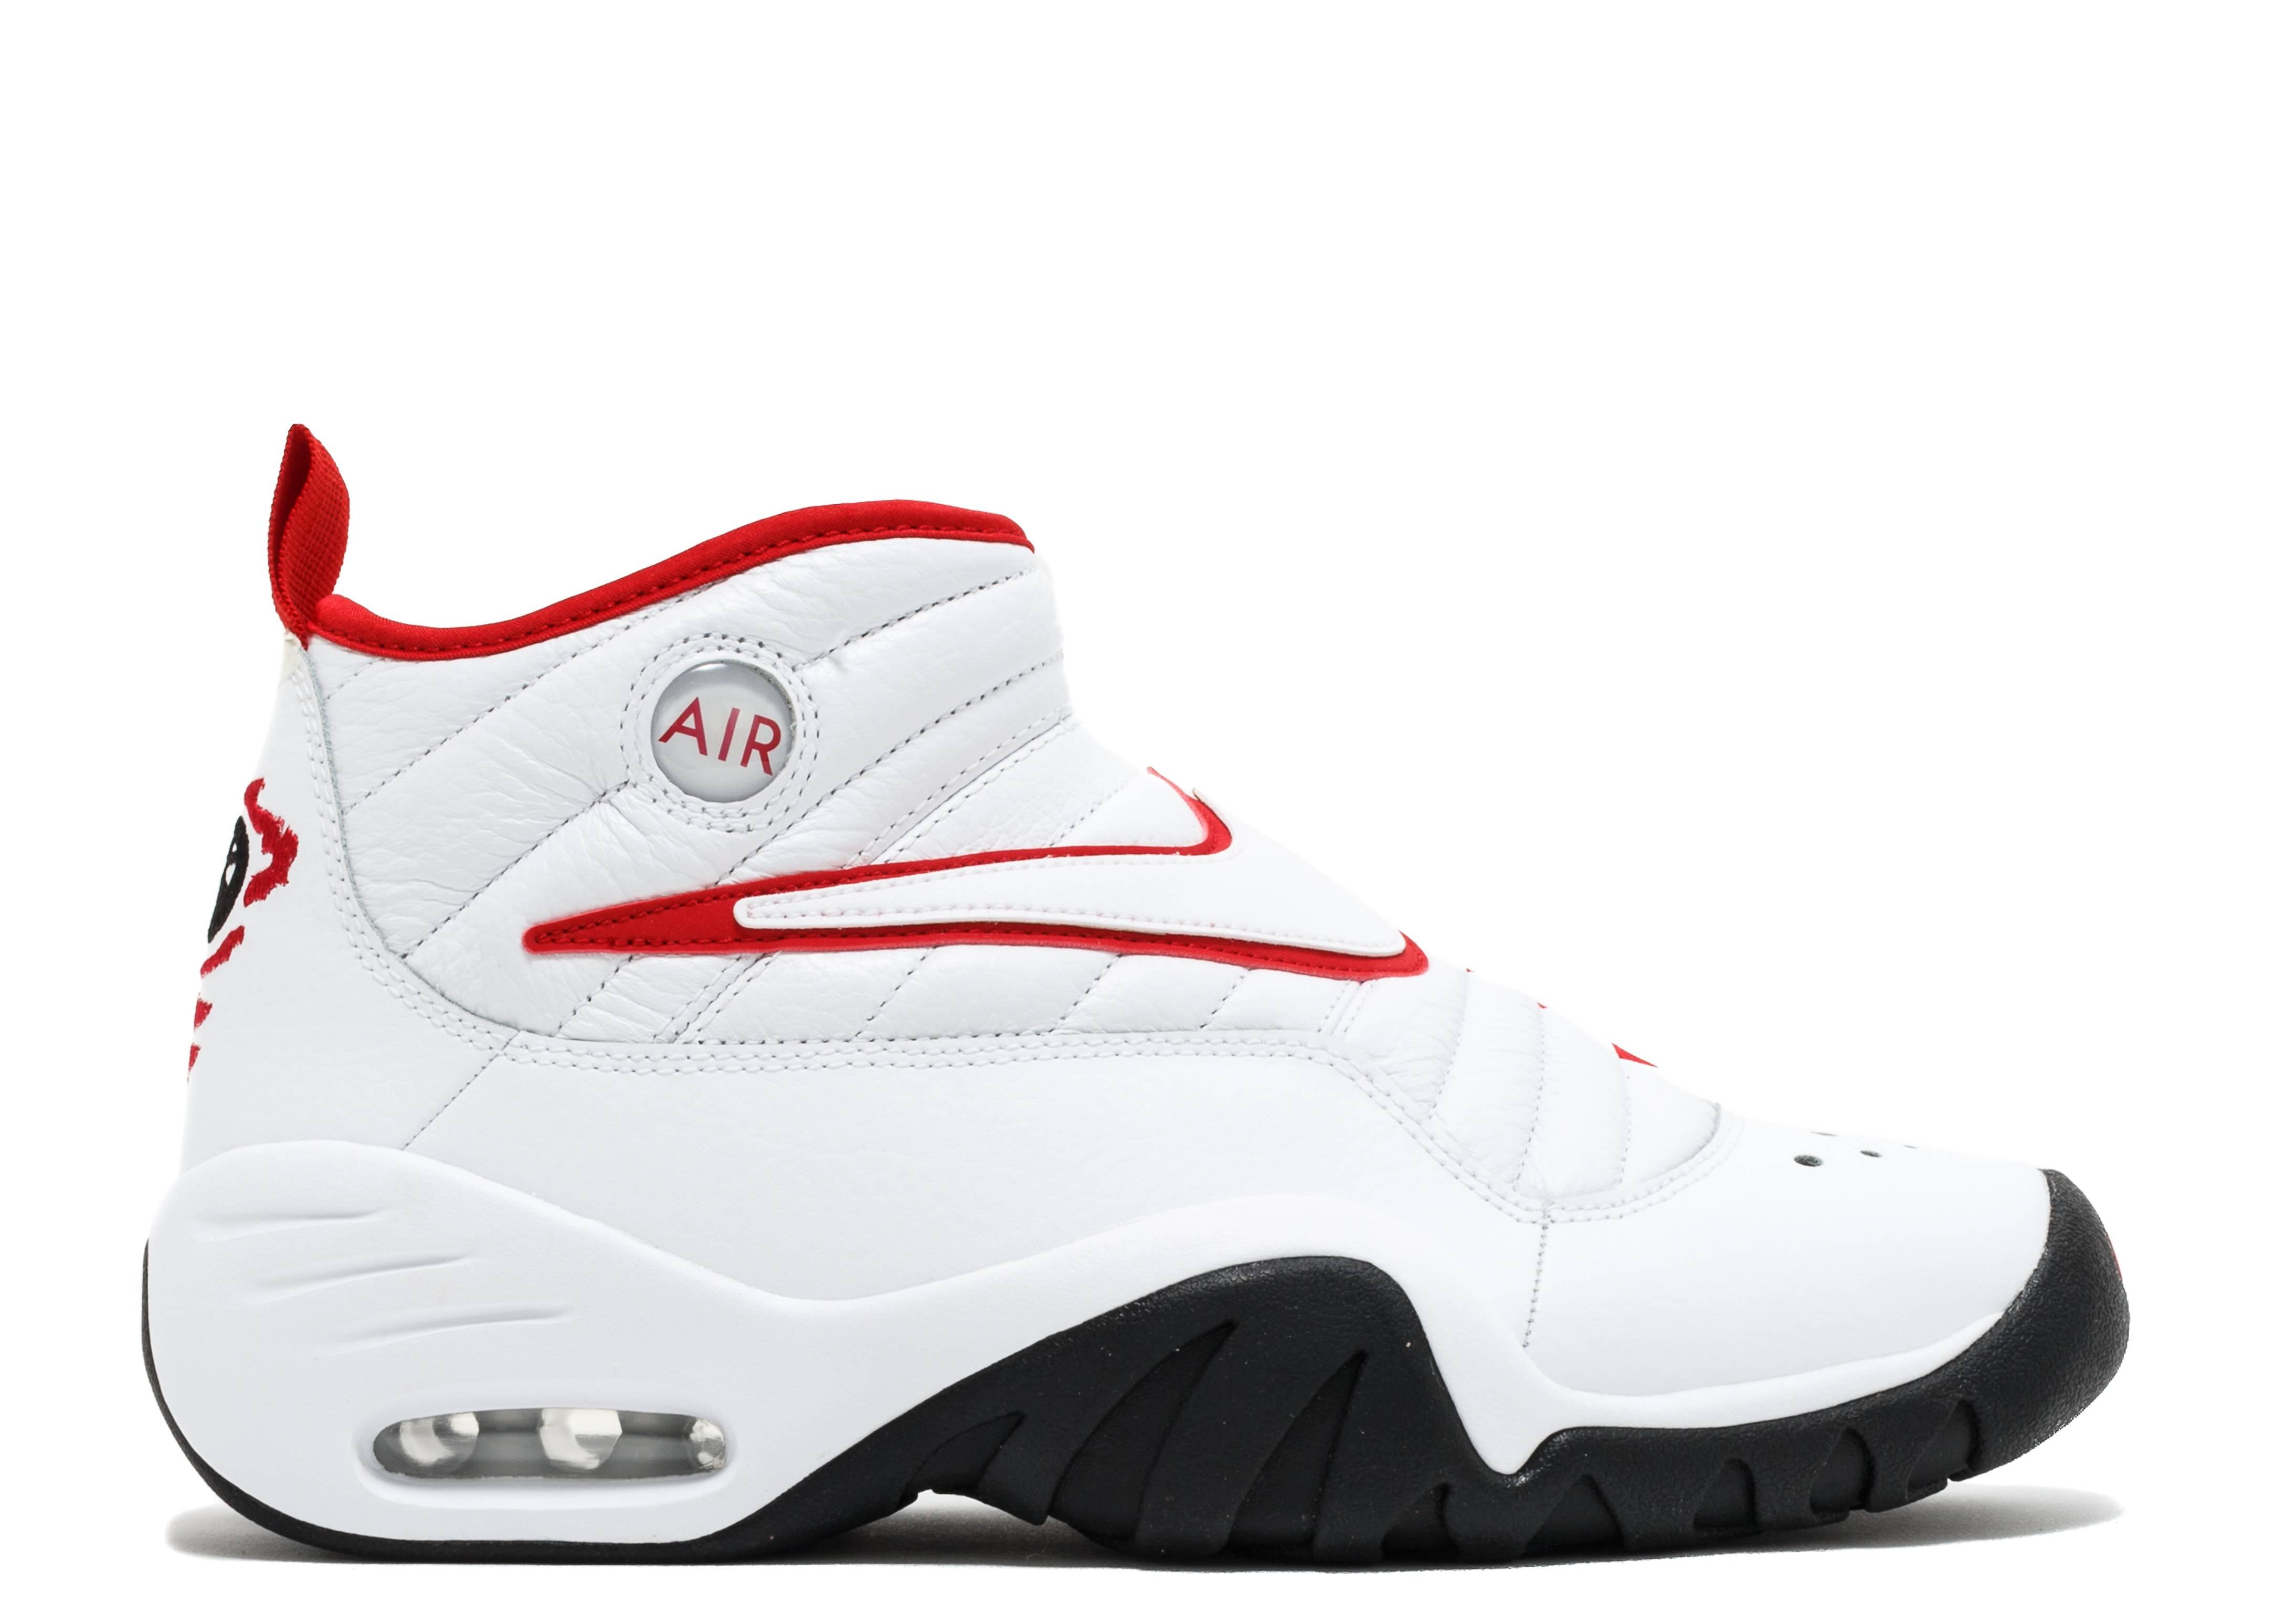 low priced 8c0f4 06163 Air Shake Ndestrukt - Nike - 880869 100 - white   white black   Flight Club